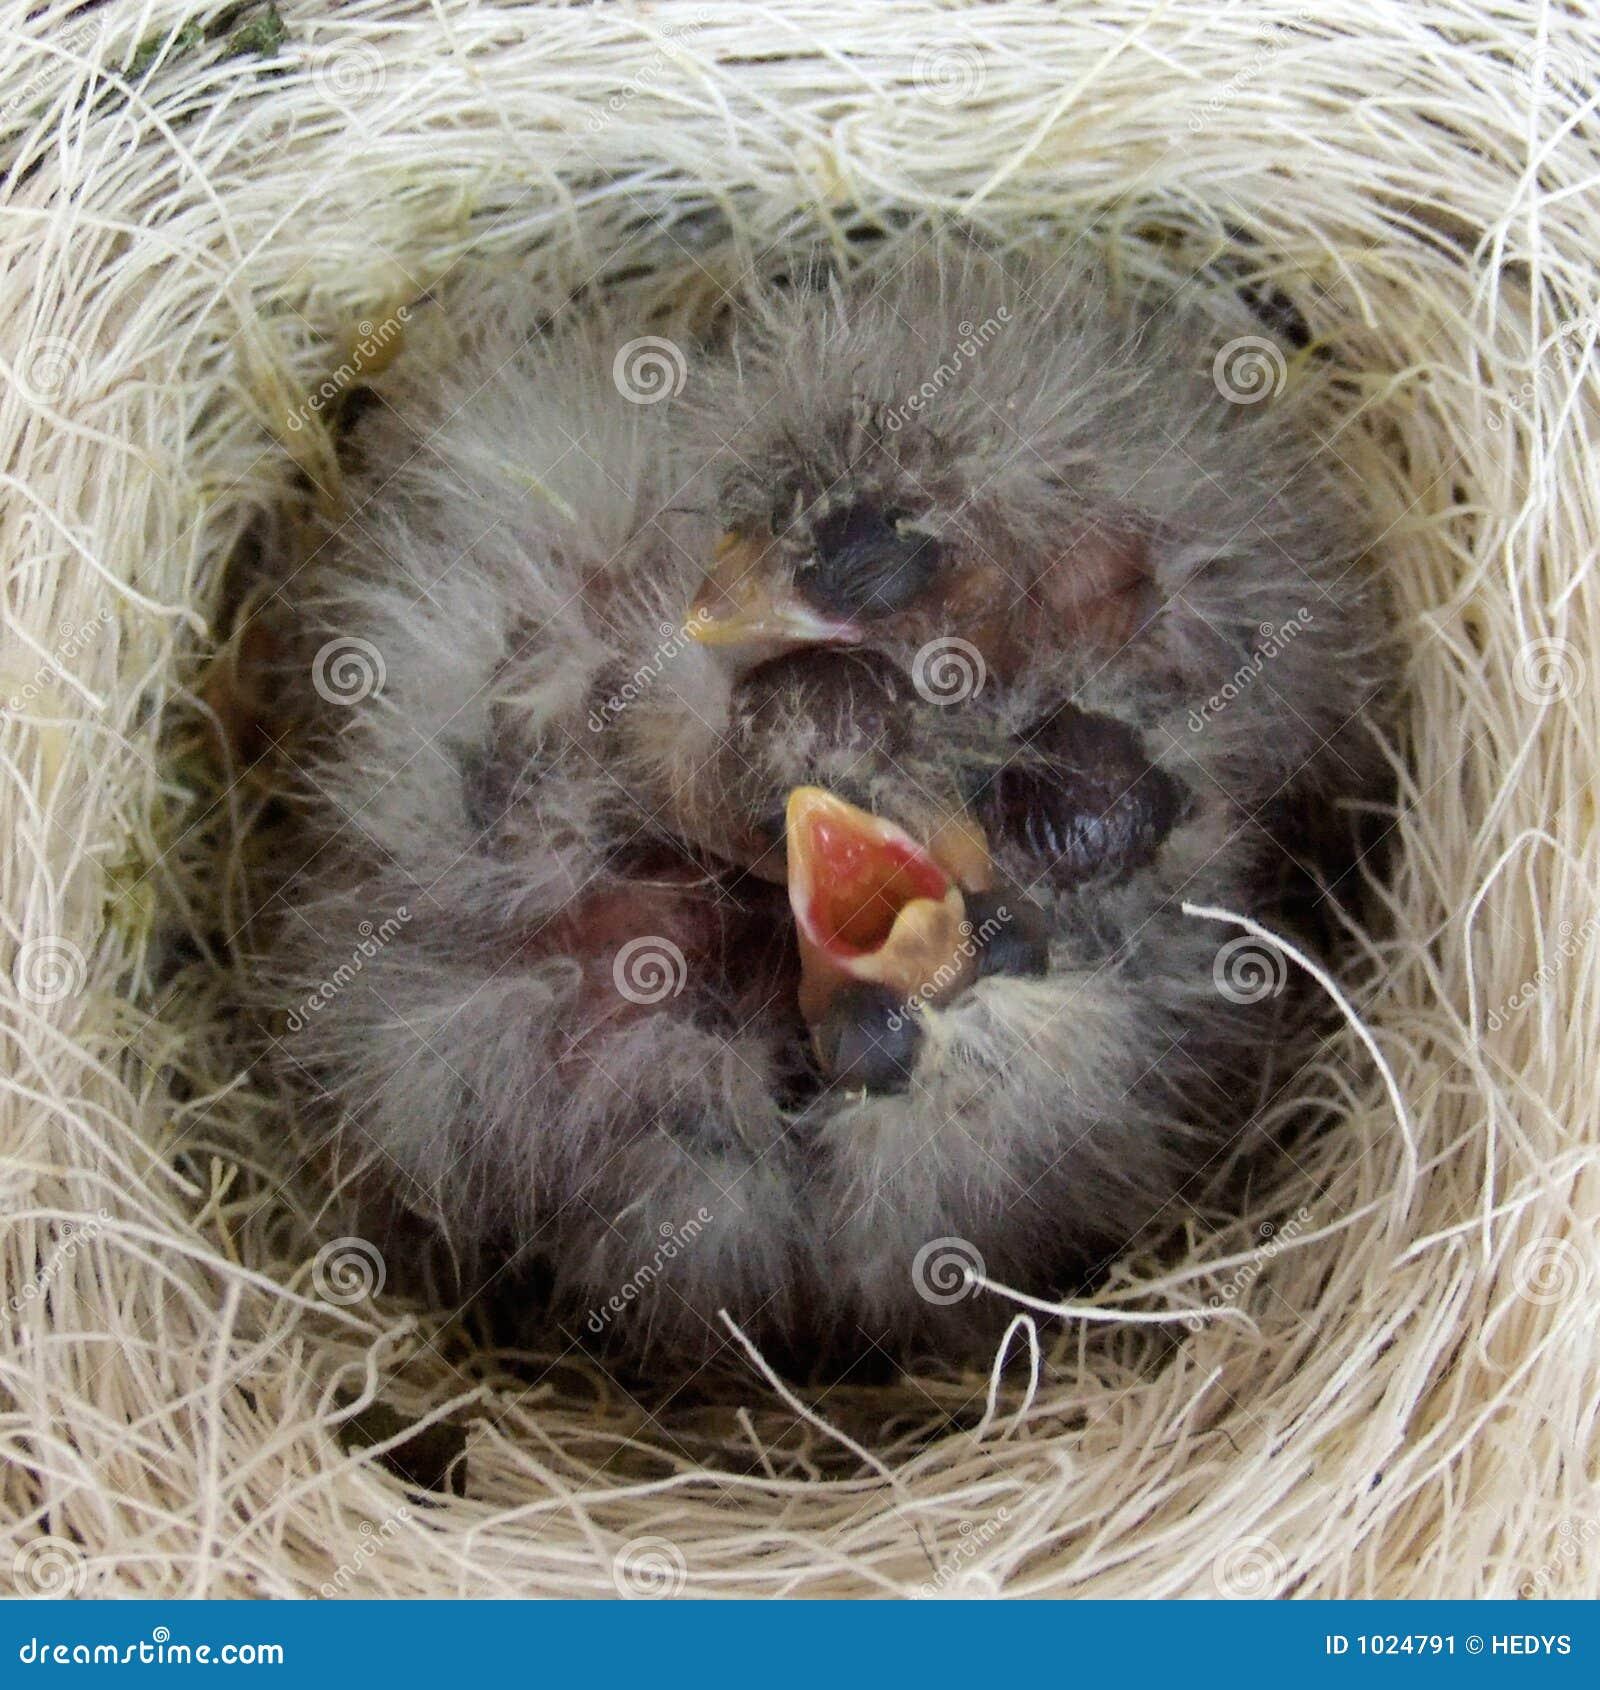 birds nest stock image image of babybirds nest birds 1024791. Black Bedroom Furniture Sets. Home Design Ideas